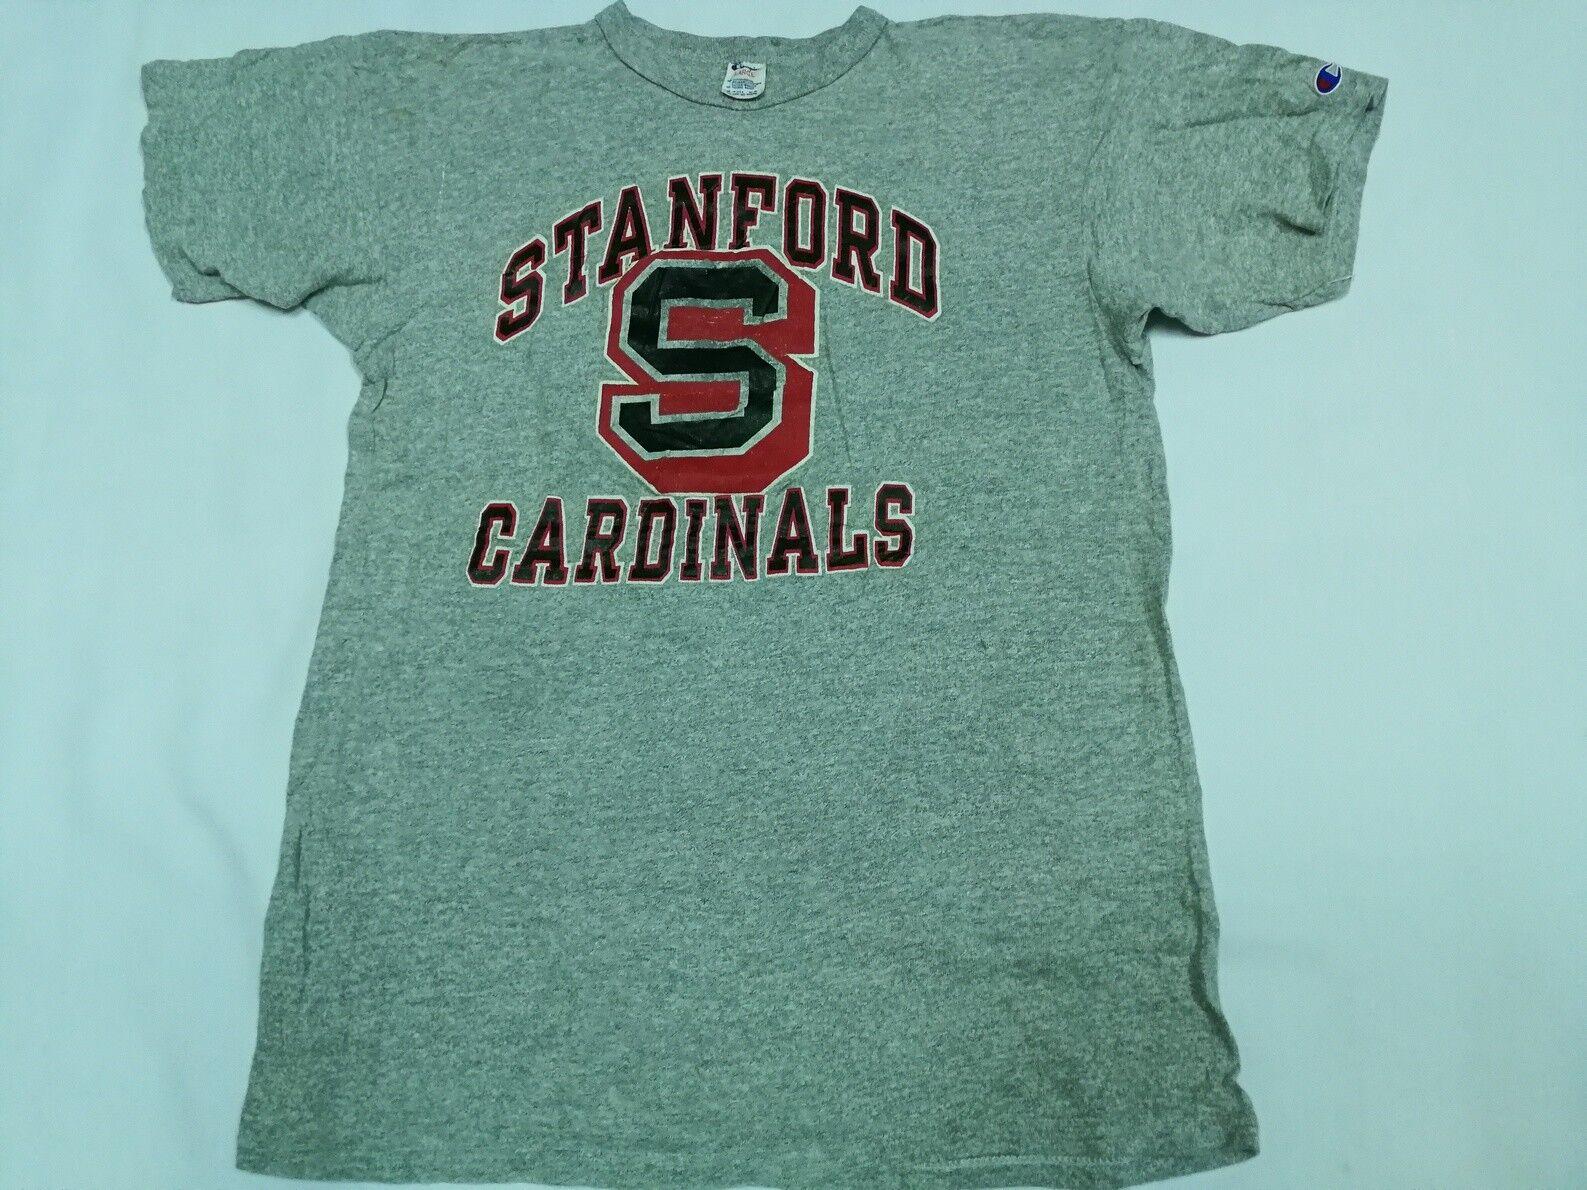 VTG CHAMPION RAYON T SHIRT USA Gray Stanford Cardinals Basketball 80s University